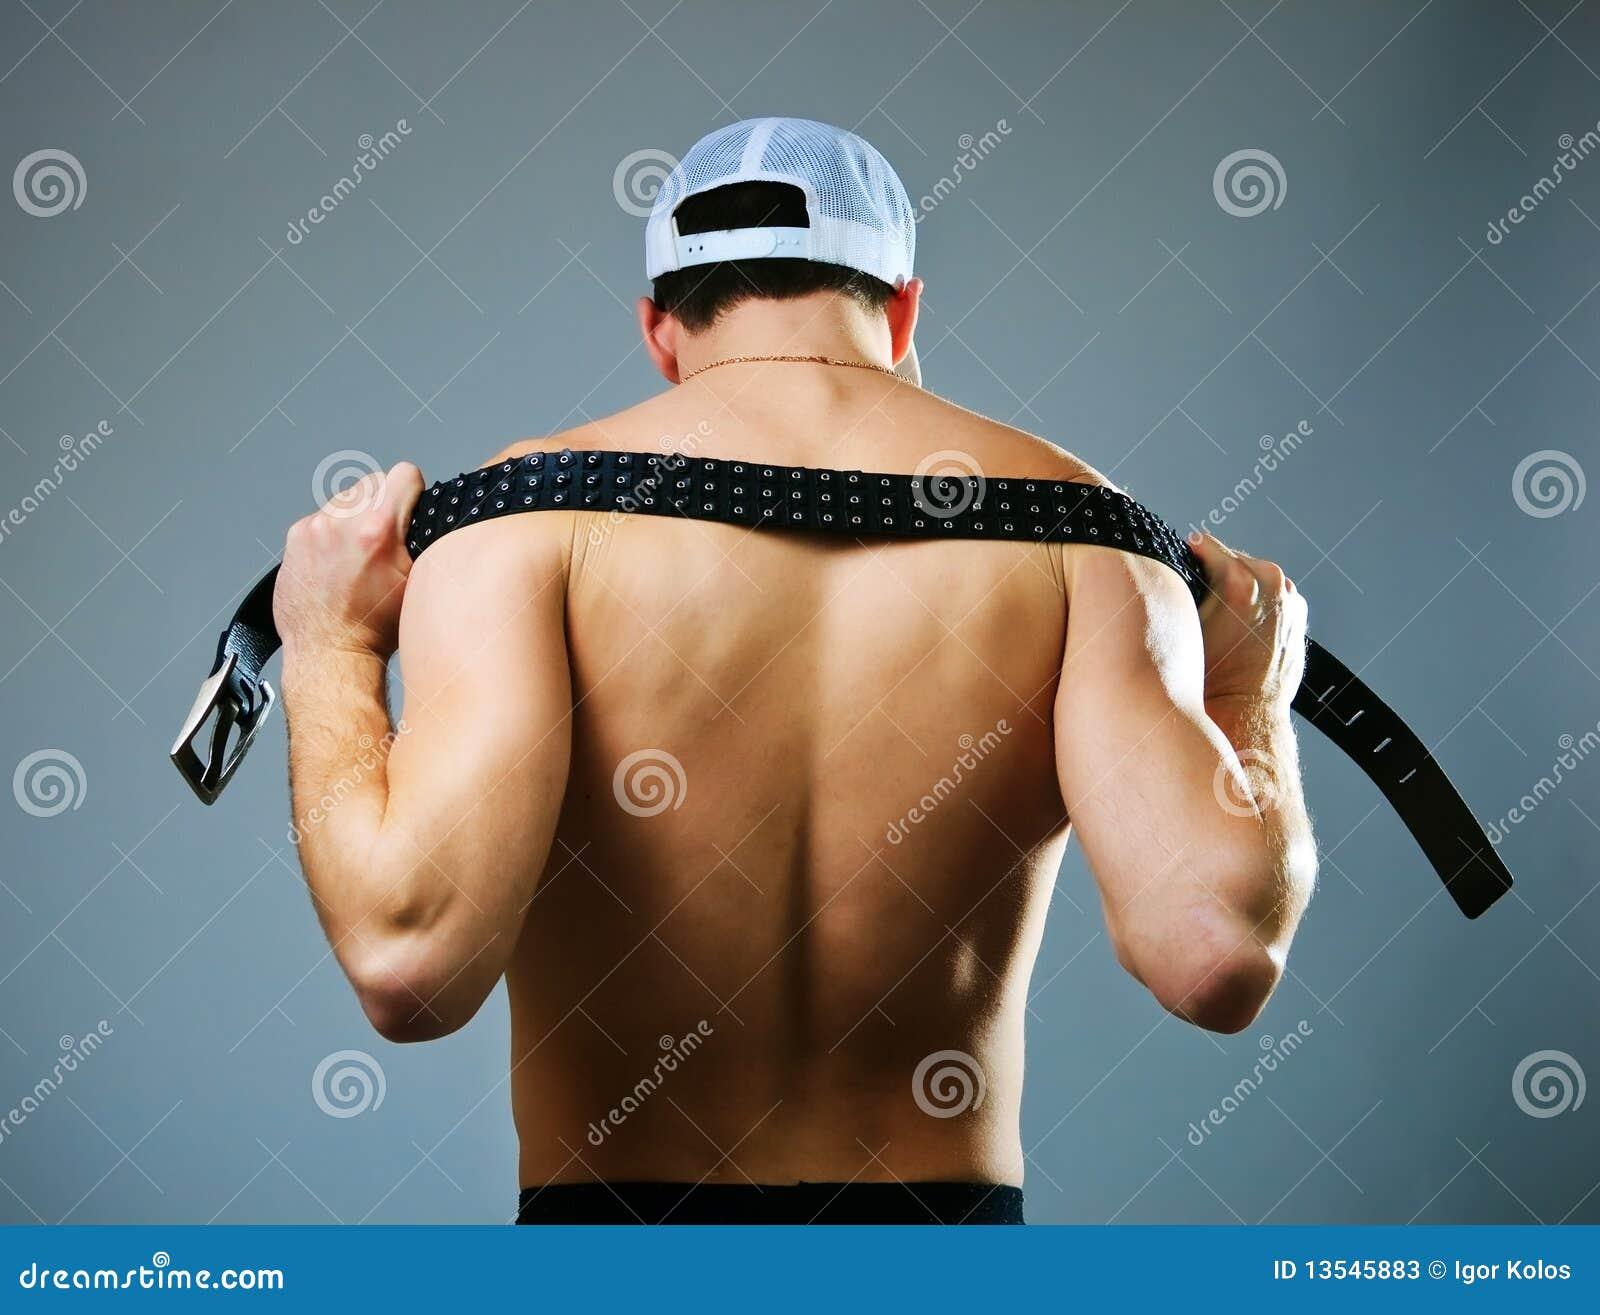 Photos d'hommes musculaires homosexuels